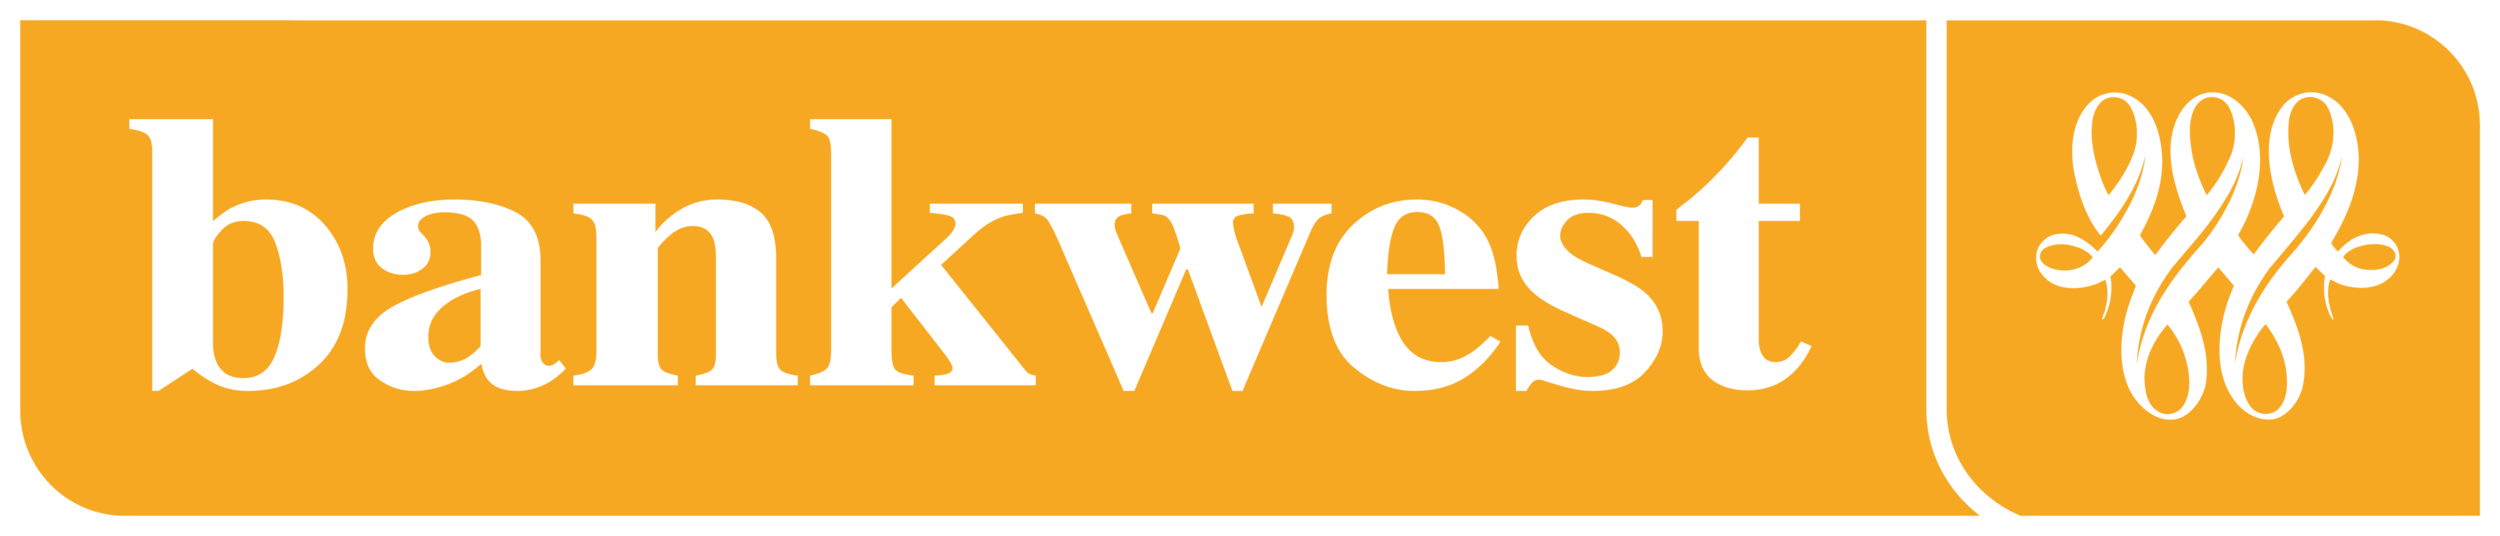 bankwest-20logo-20cmyk.png